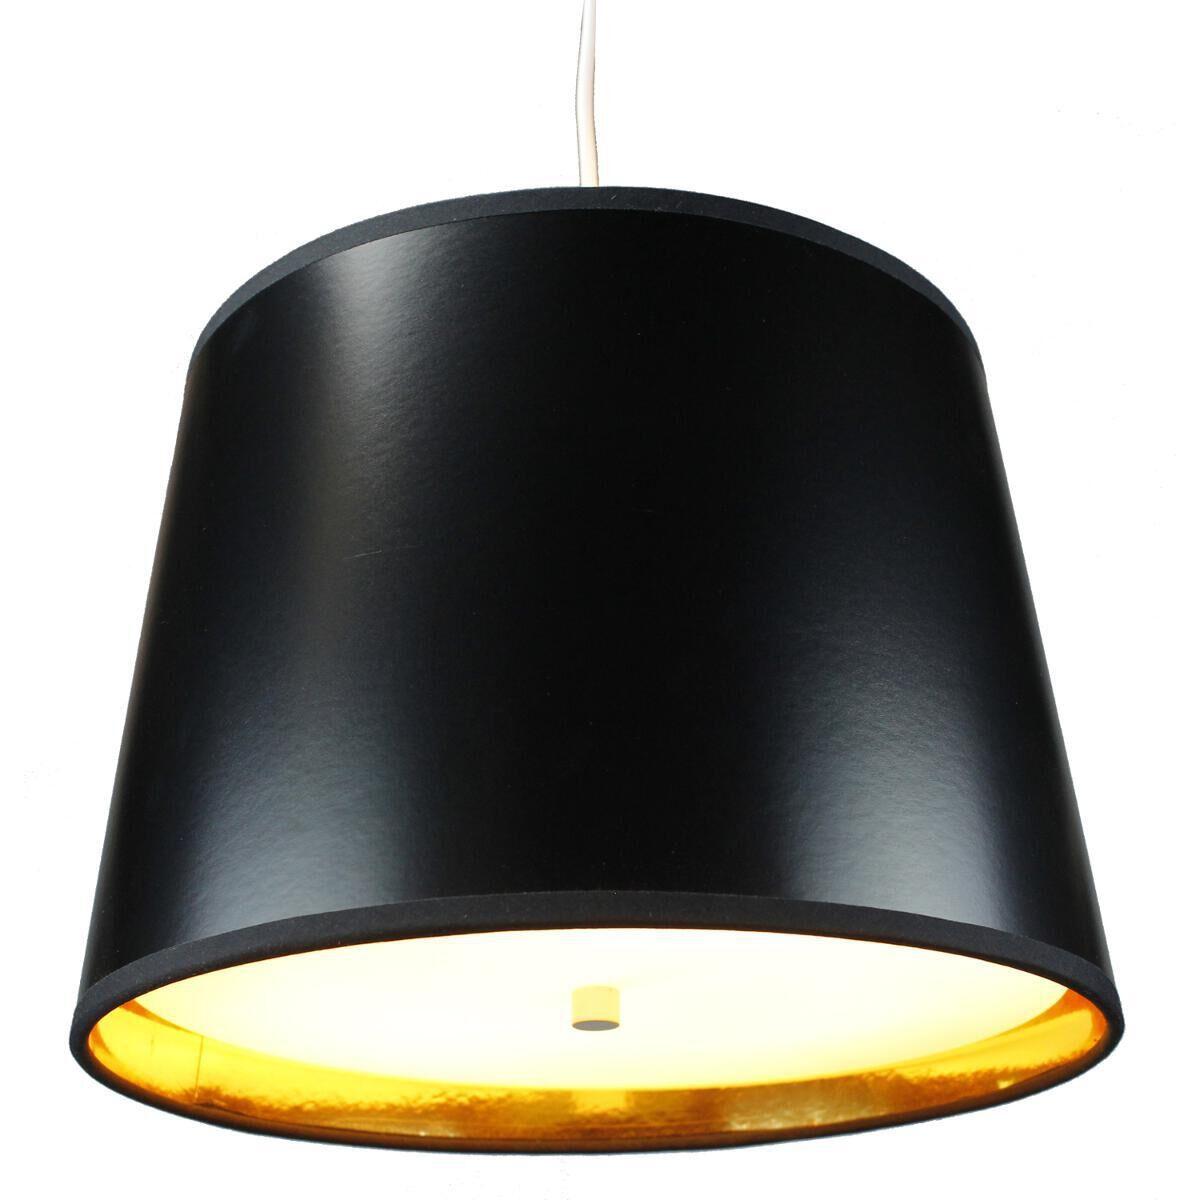 Dov 2-Light Drum Pendant Shade Color: Black Gold, Size: 10